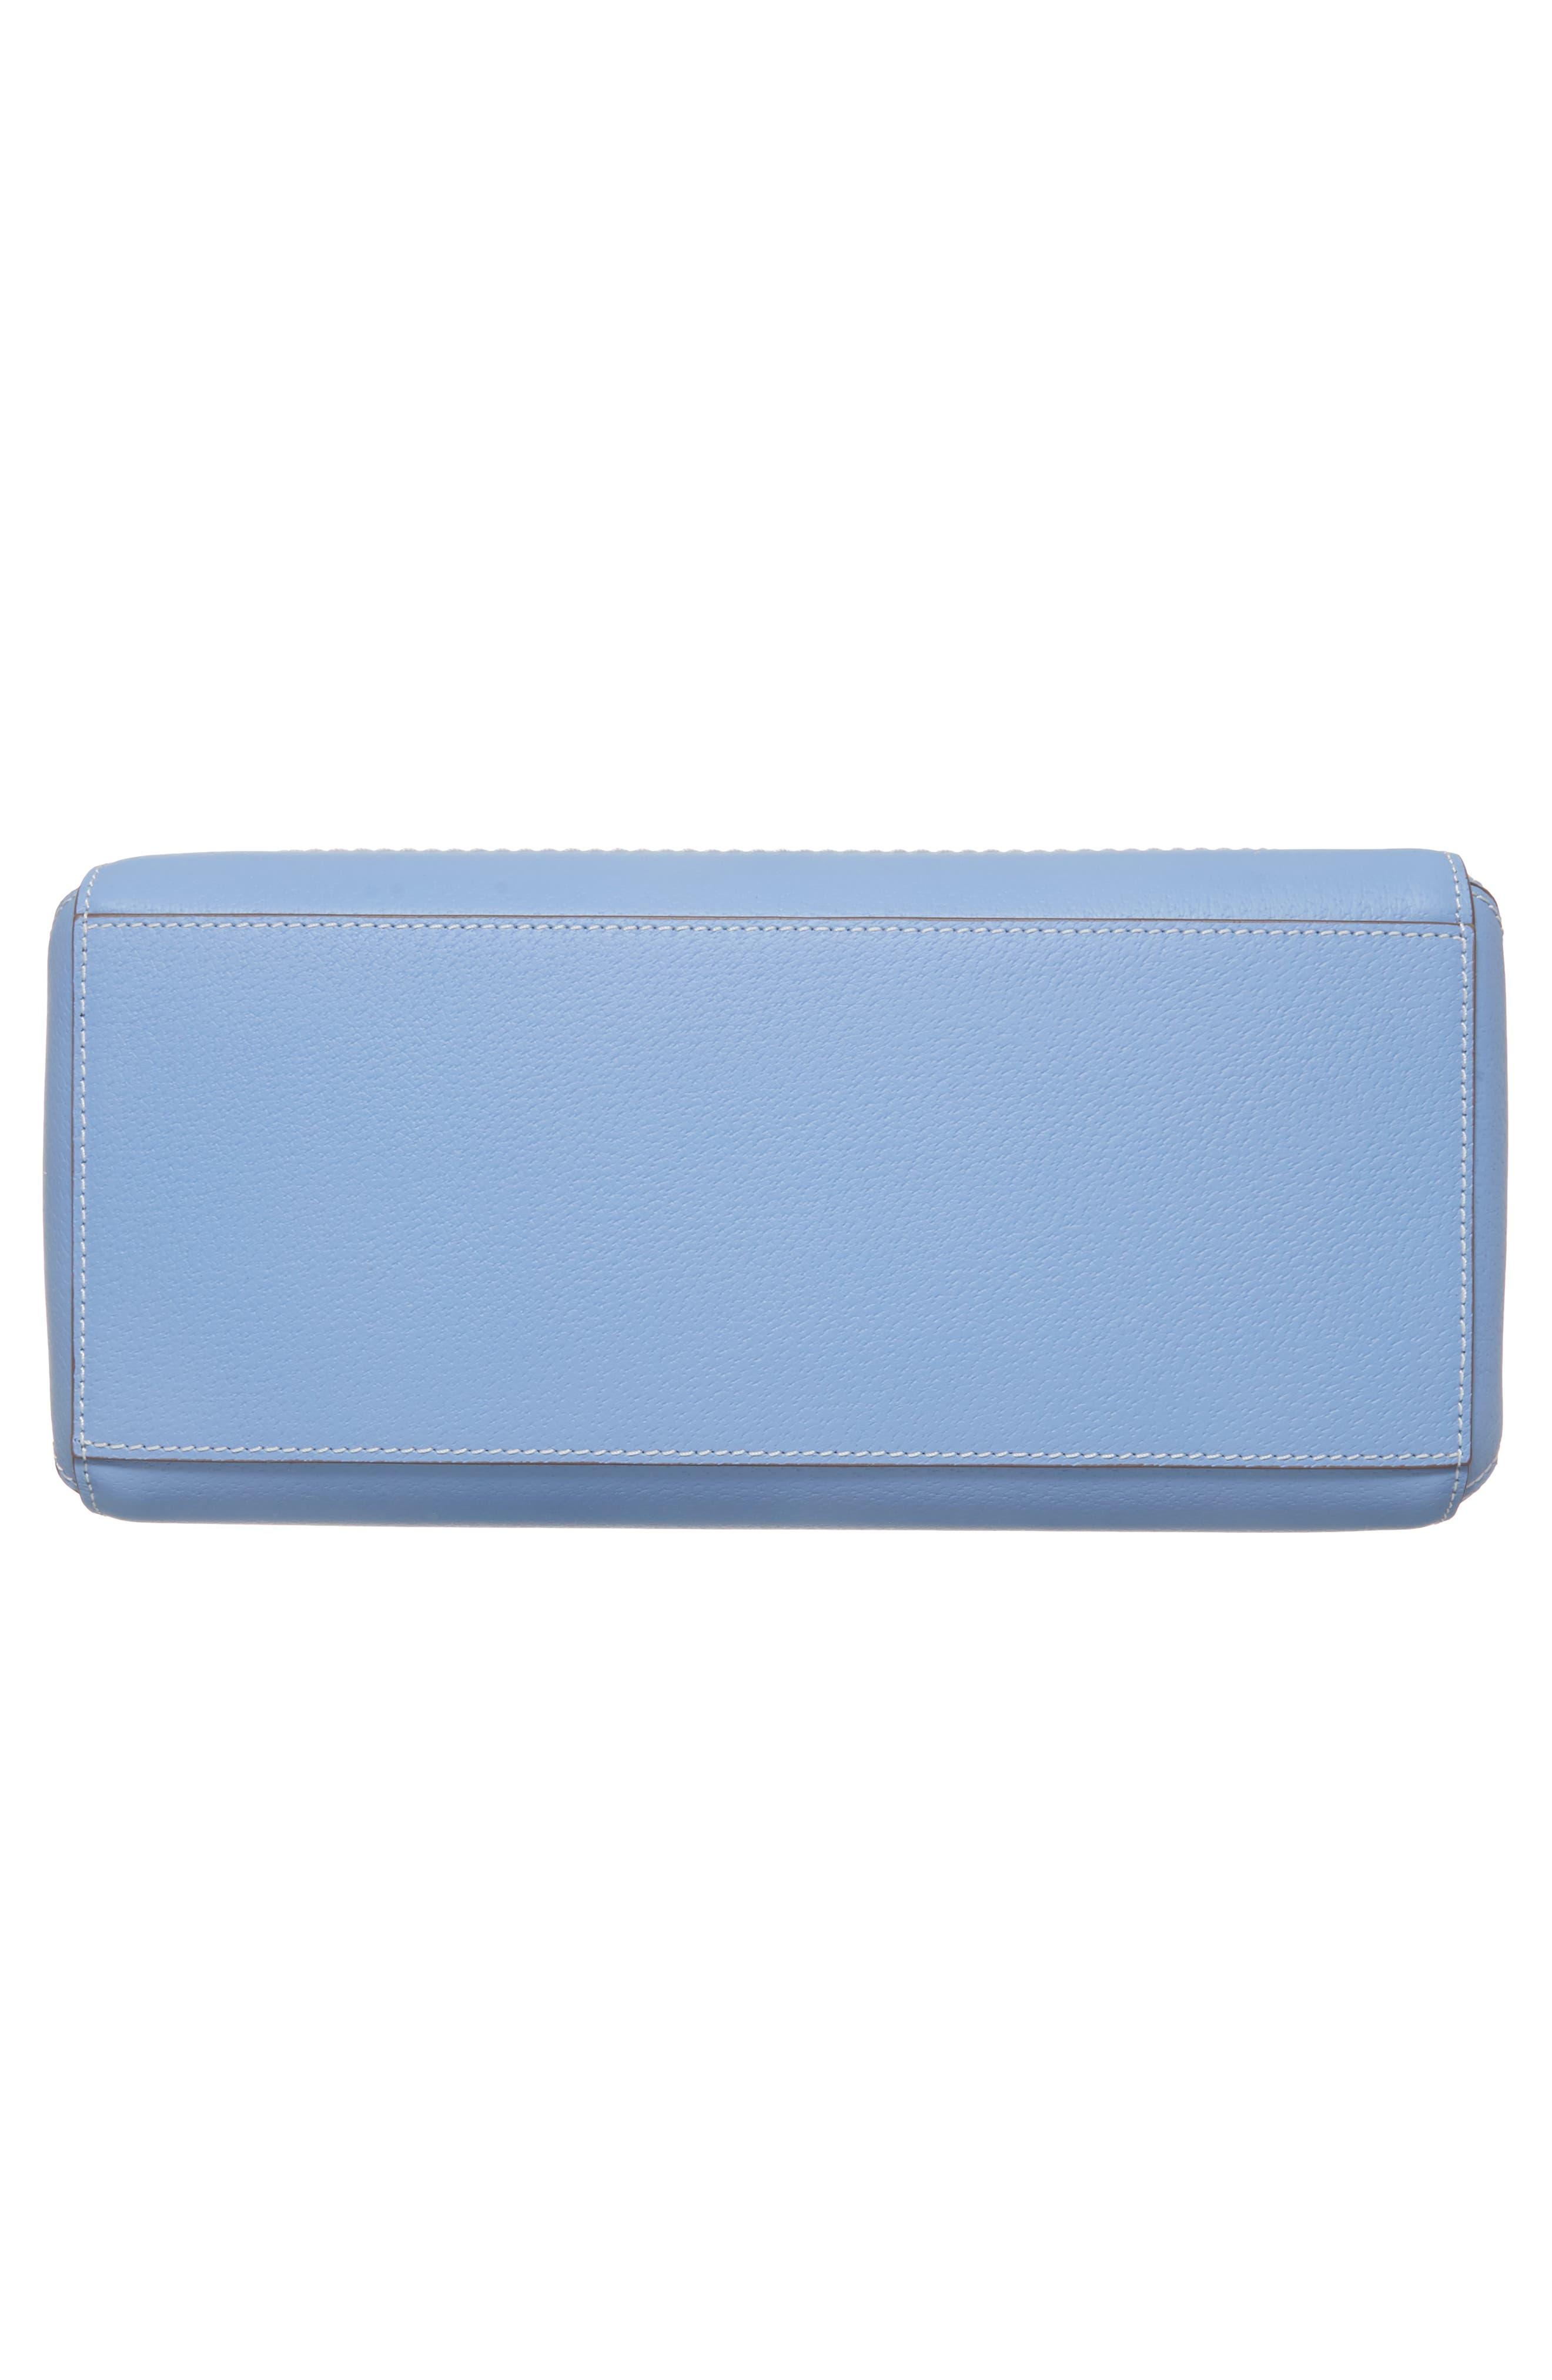 thompson street - marti leather shoulder/crossbody bag,                             Alternate thumbnail 6, color,                             Fable Blue